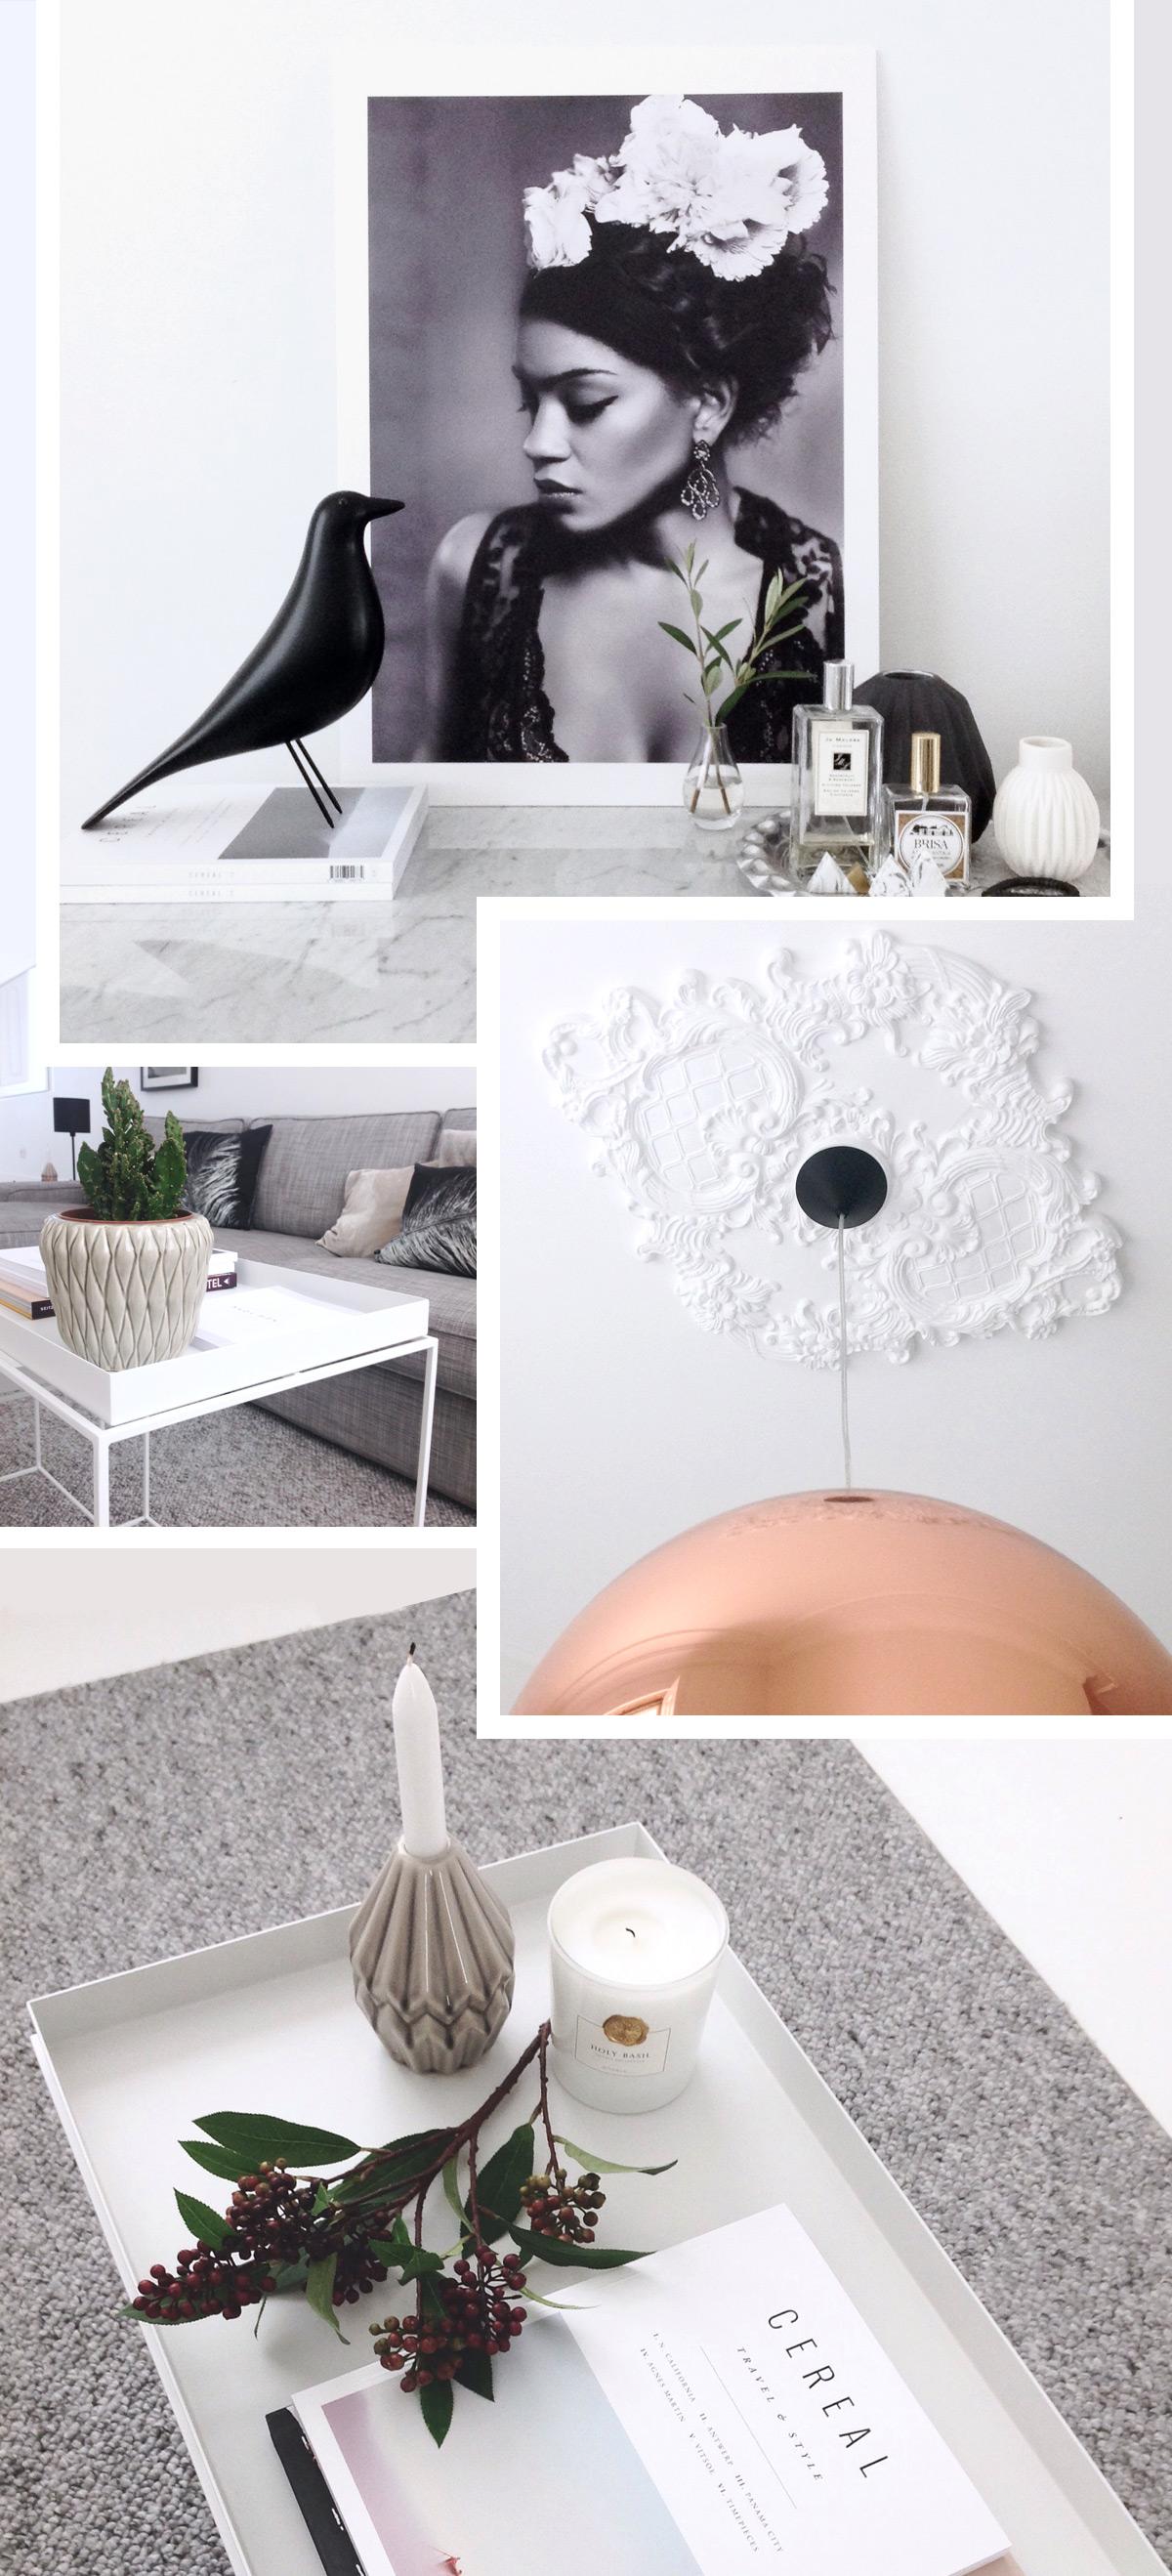 Inside Your Homes - SUSANA-OLIVEIRA- Tom Dixon Copper Round Pendant, Vitra Eames House Bird,  Hay Tray Table.jpg